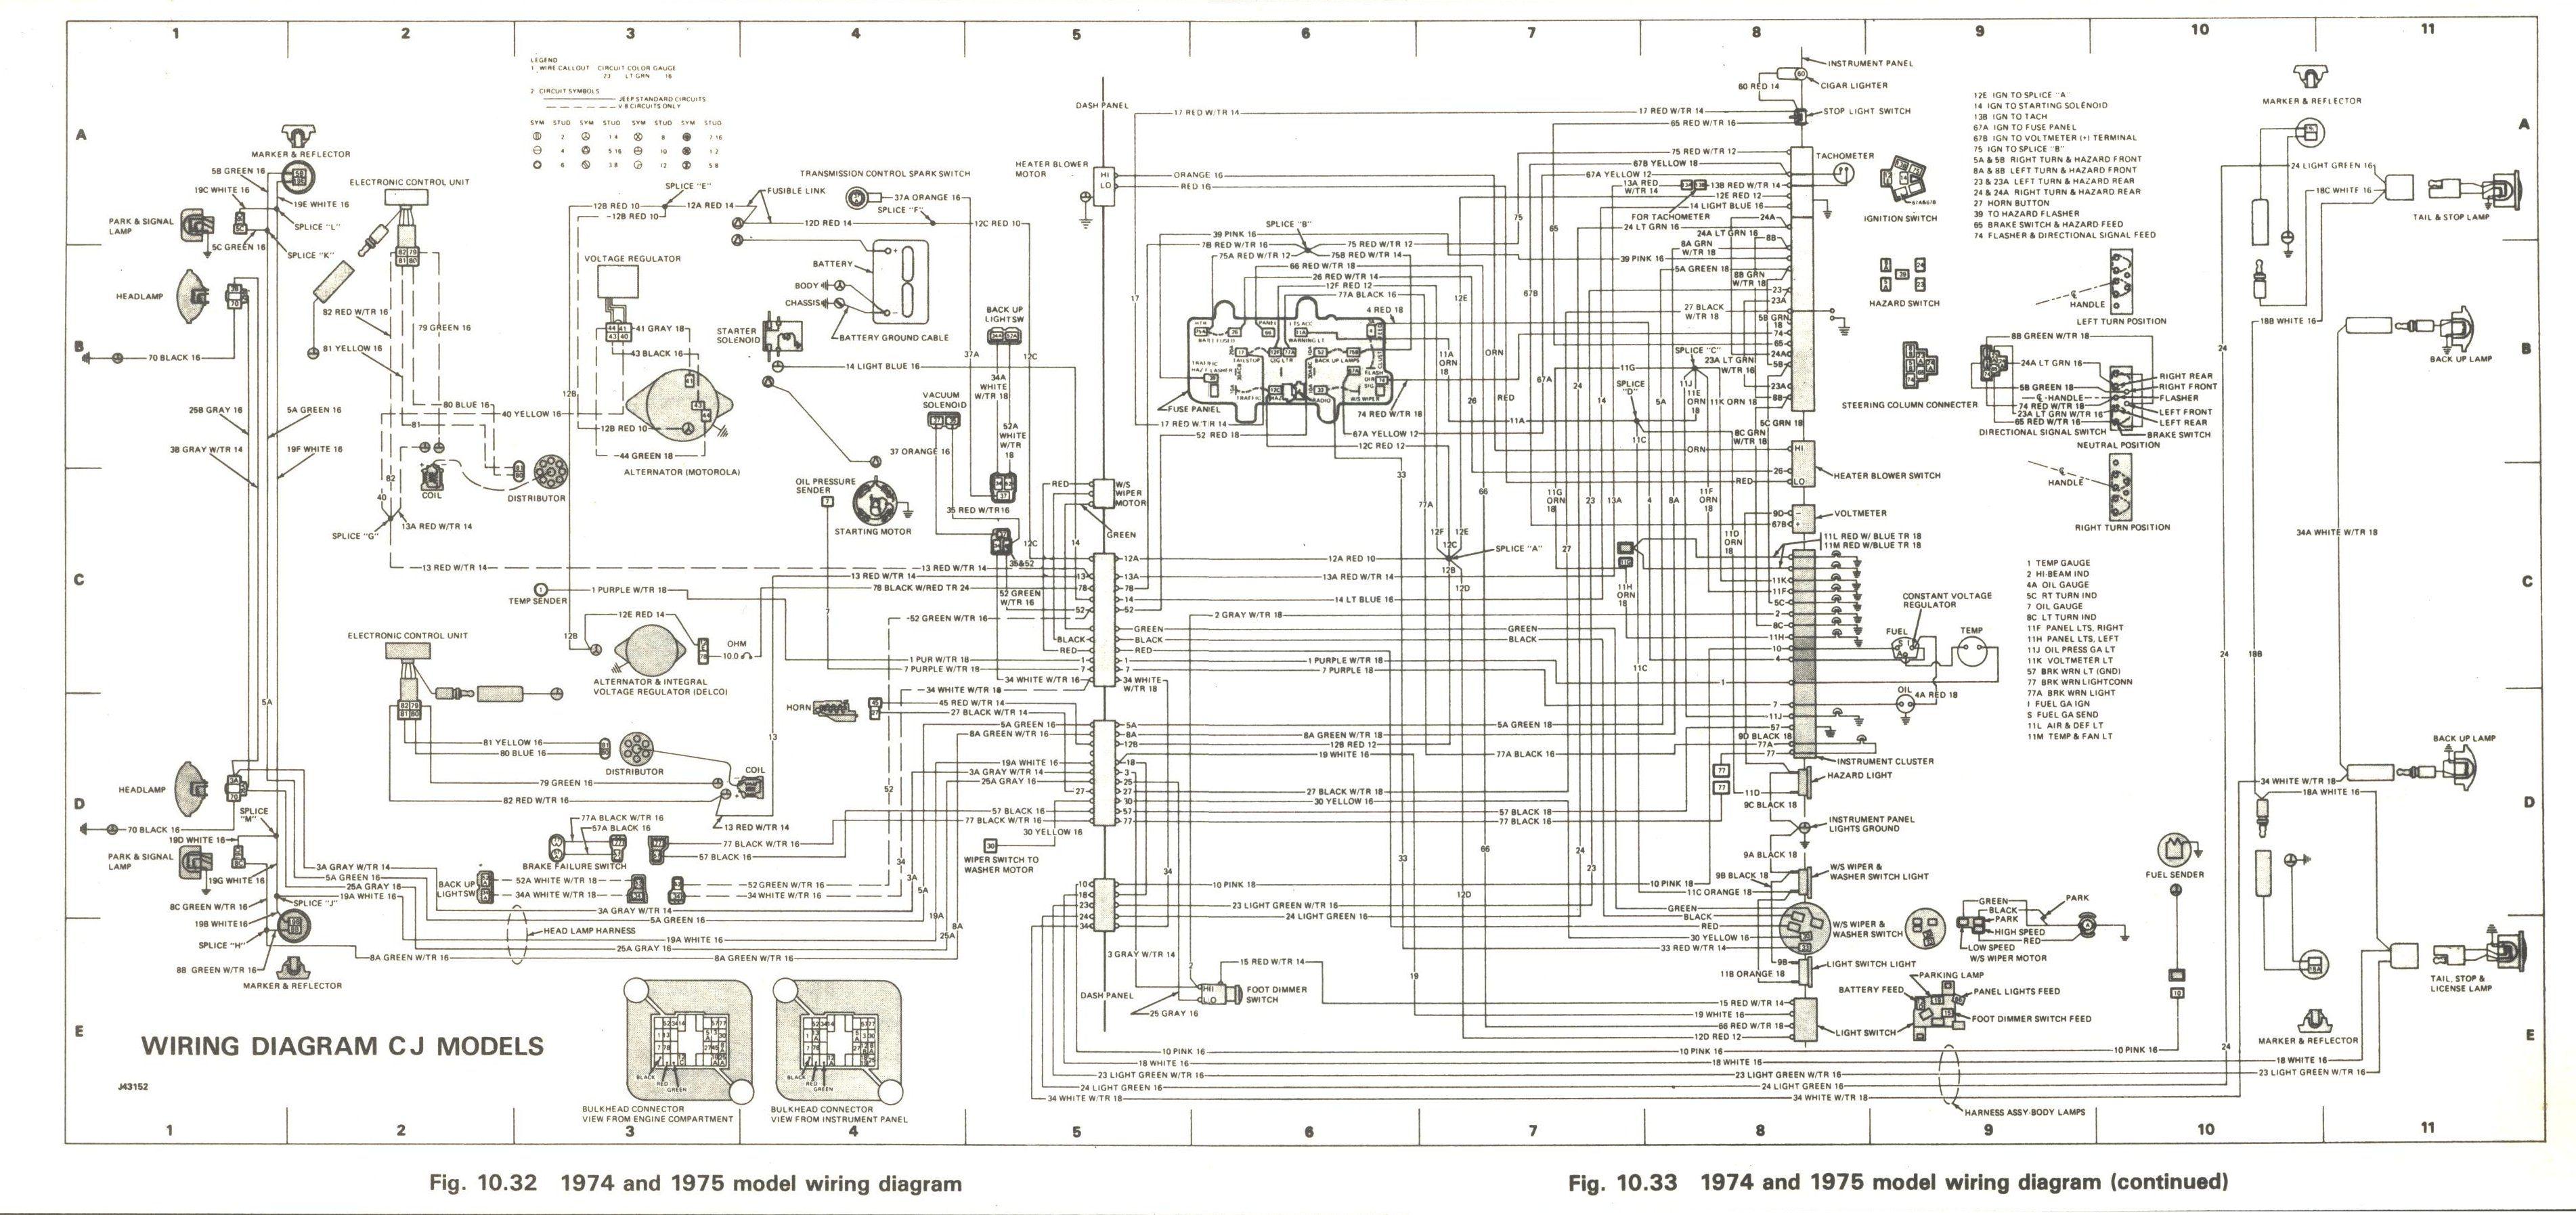 Terrific Painless Wiring Diagram 1974 Cj5 Jeep Wiring Diagram Tutorial Wiring Cloud Grayisramohammedshrineorg